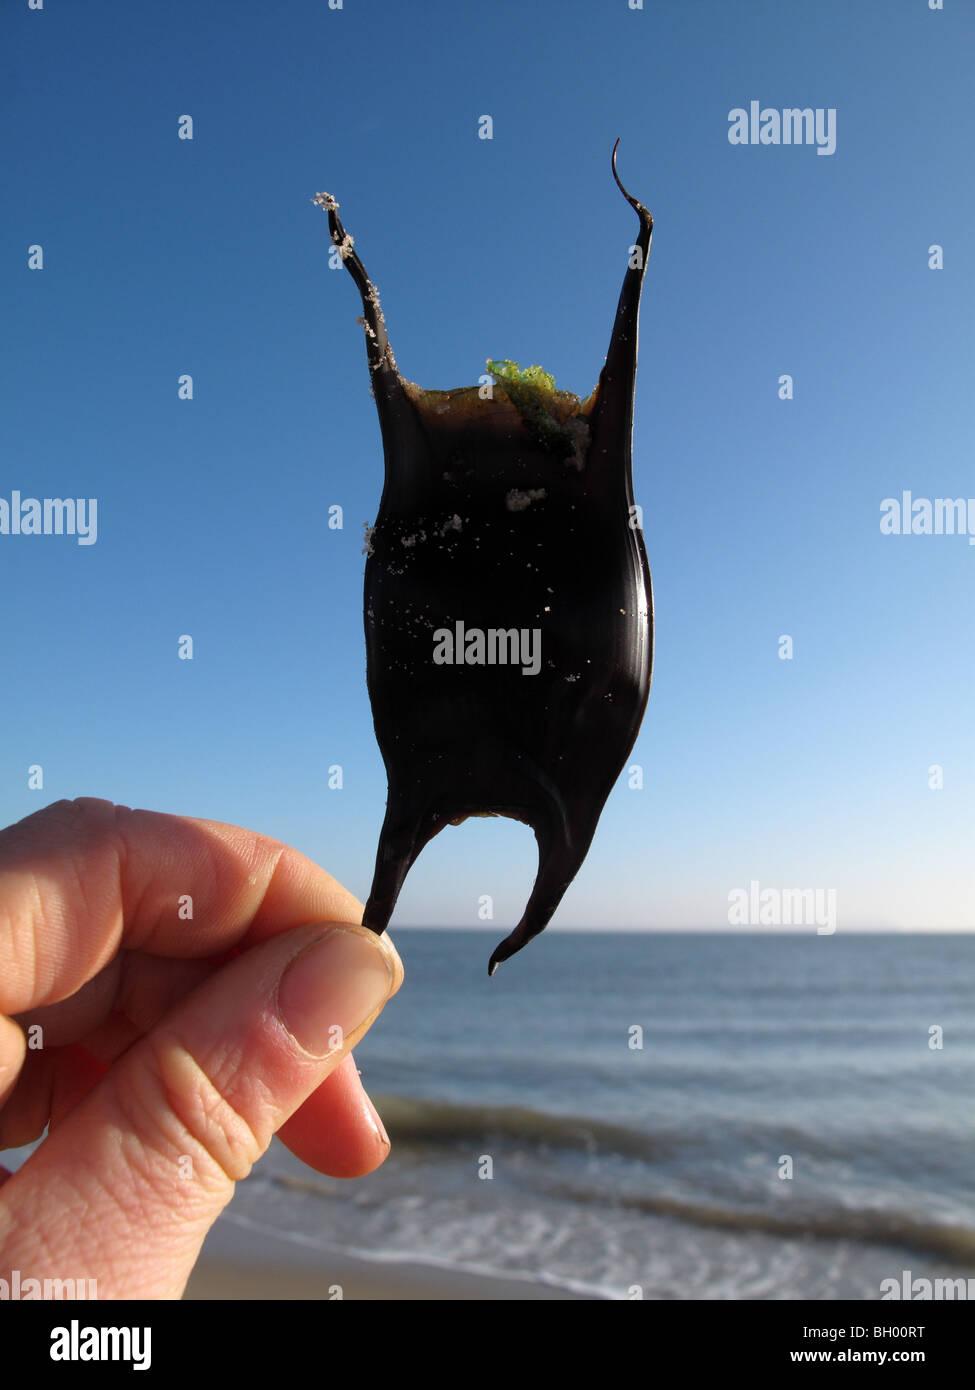 Mermaid's purse - Stock Image